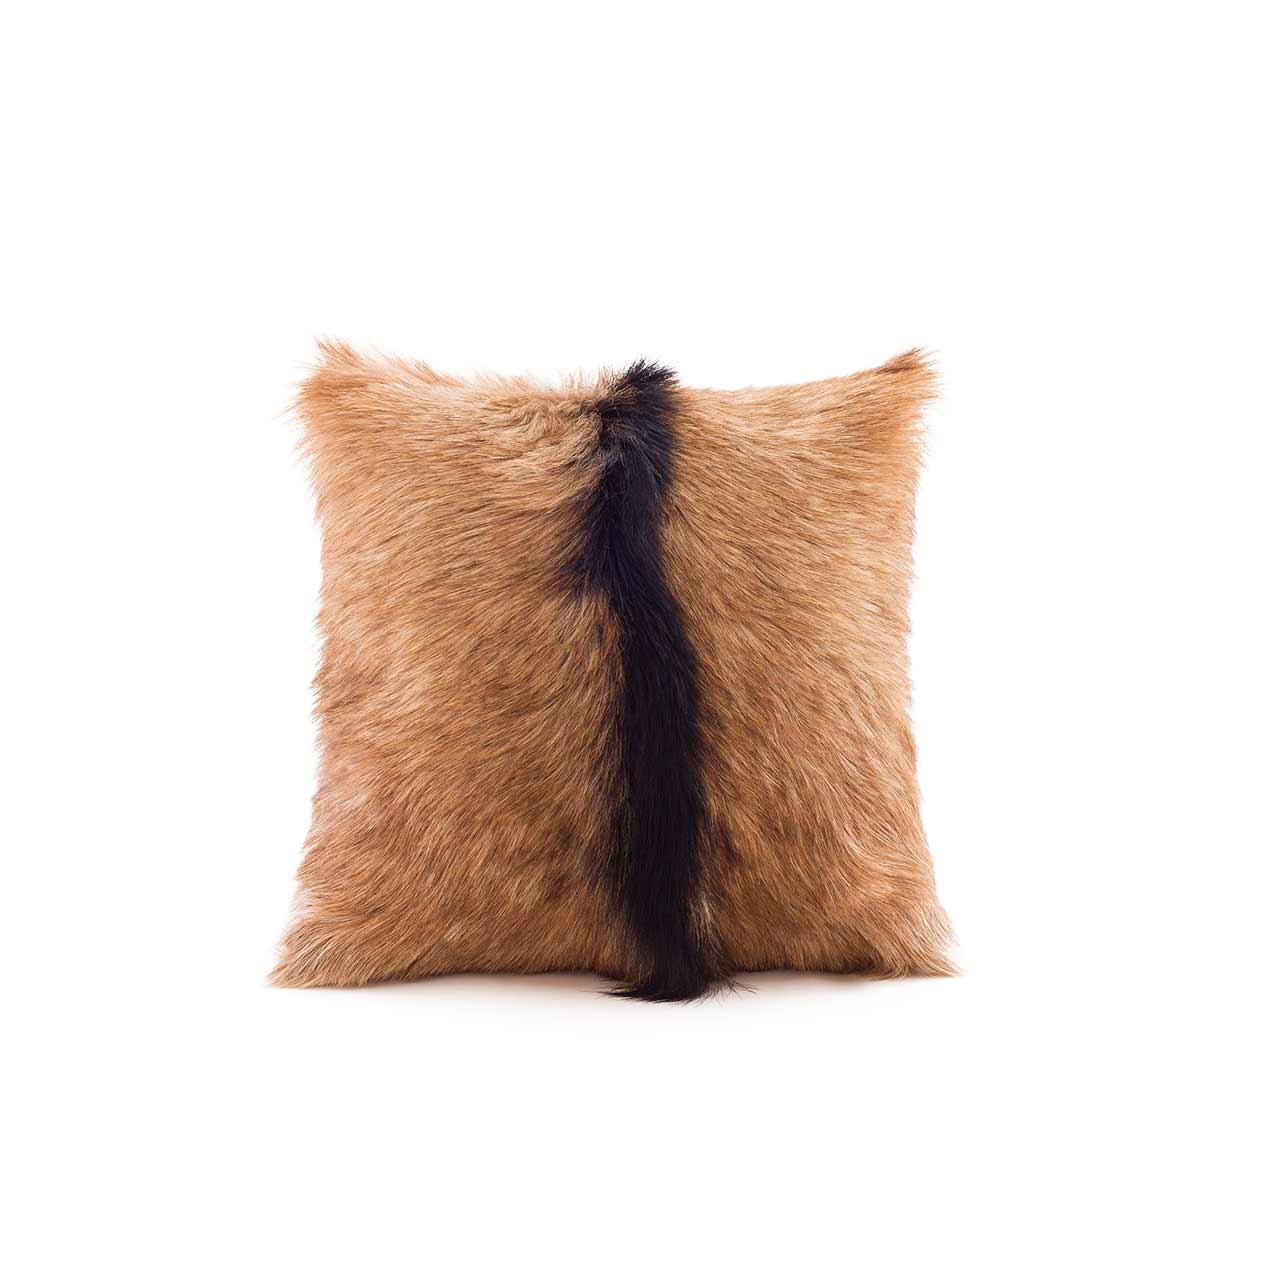 woola_goat_cushion_square